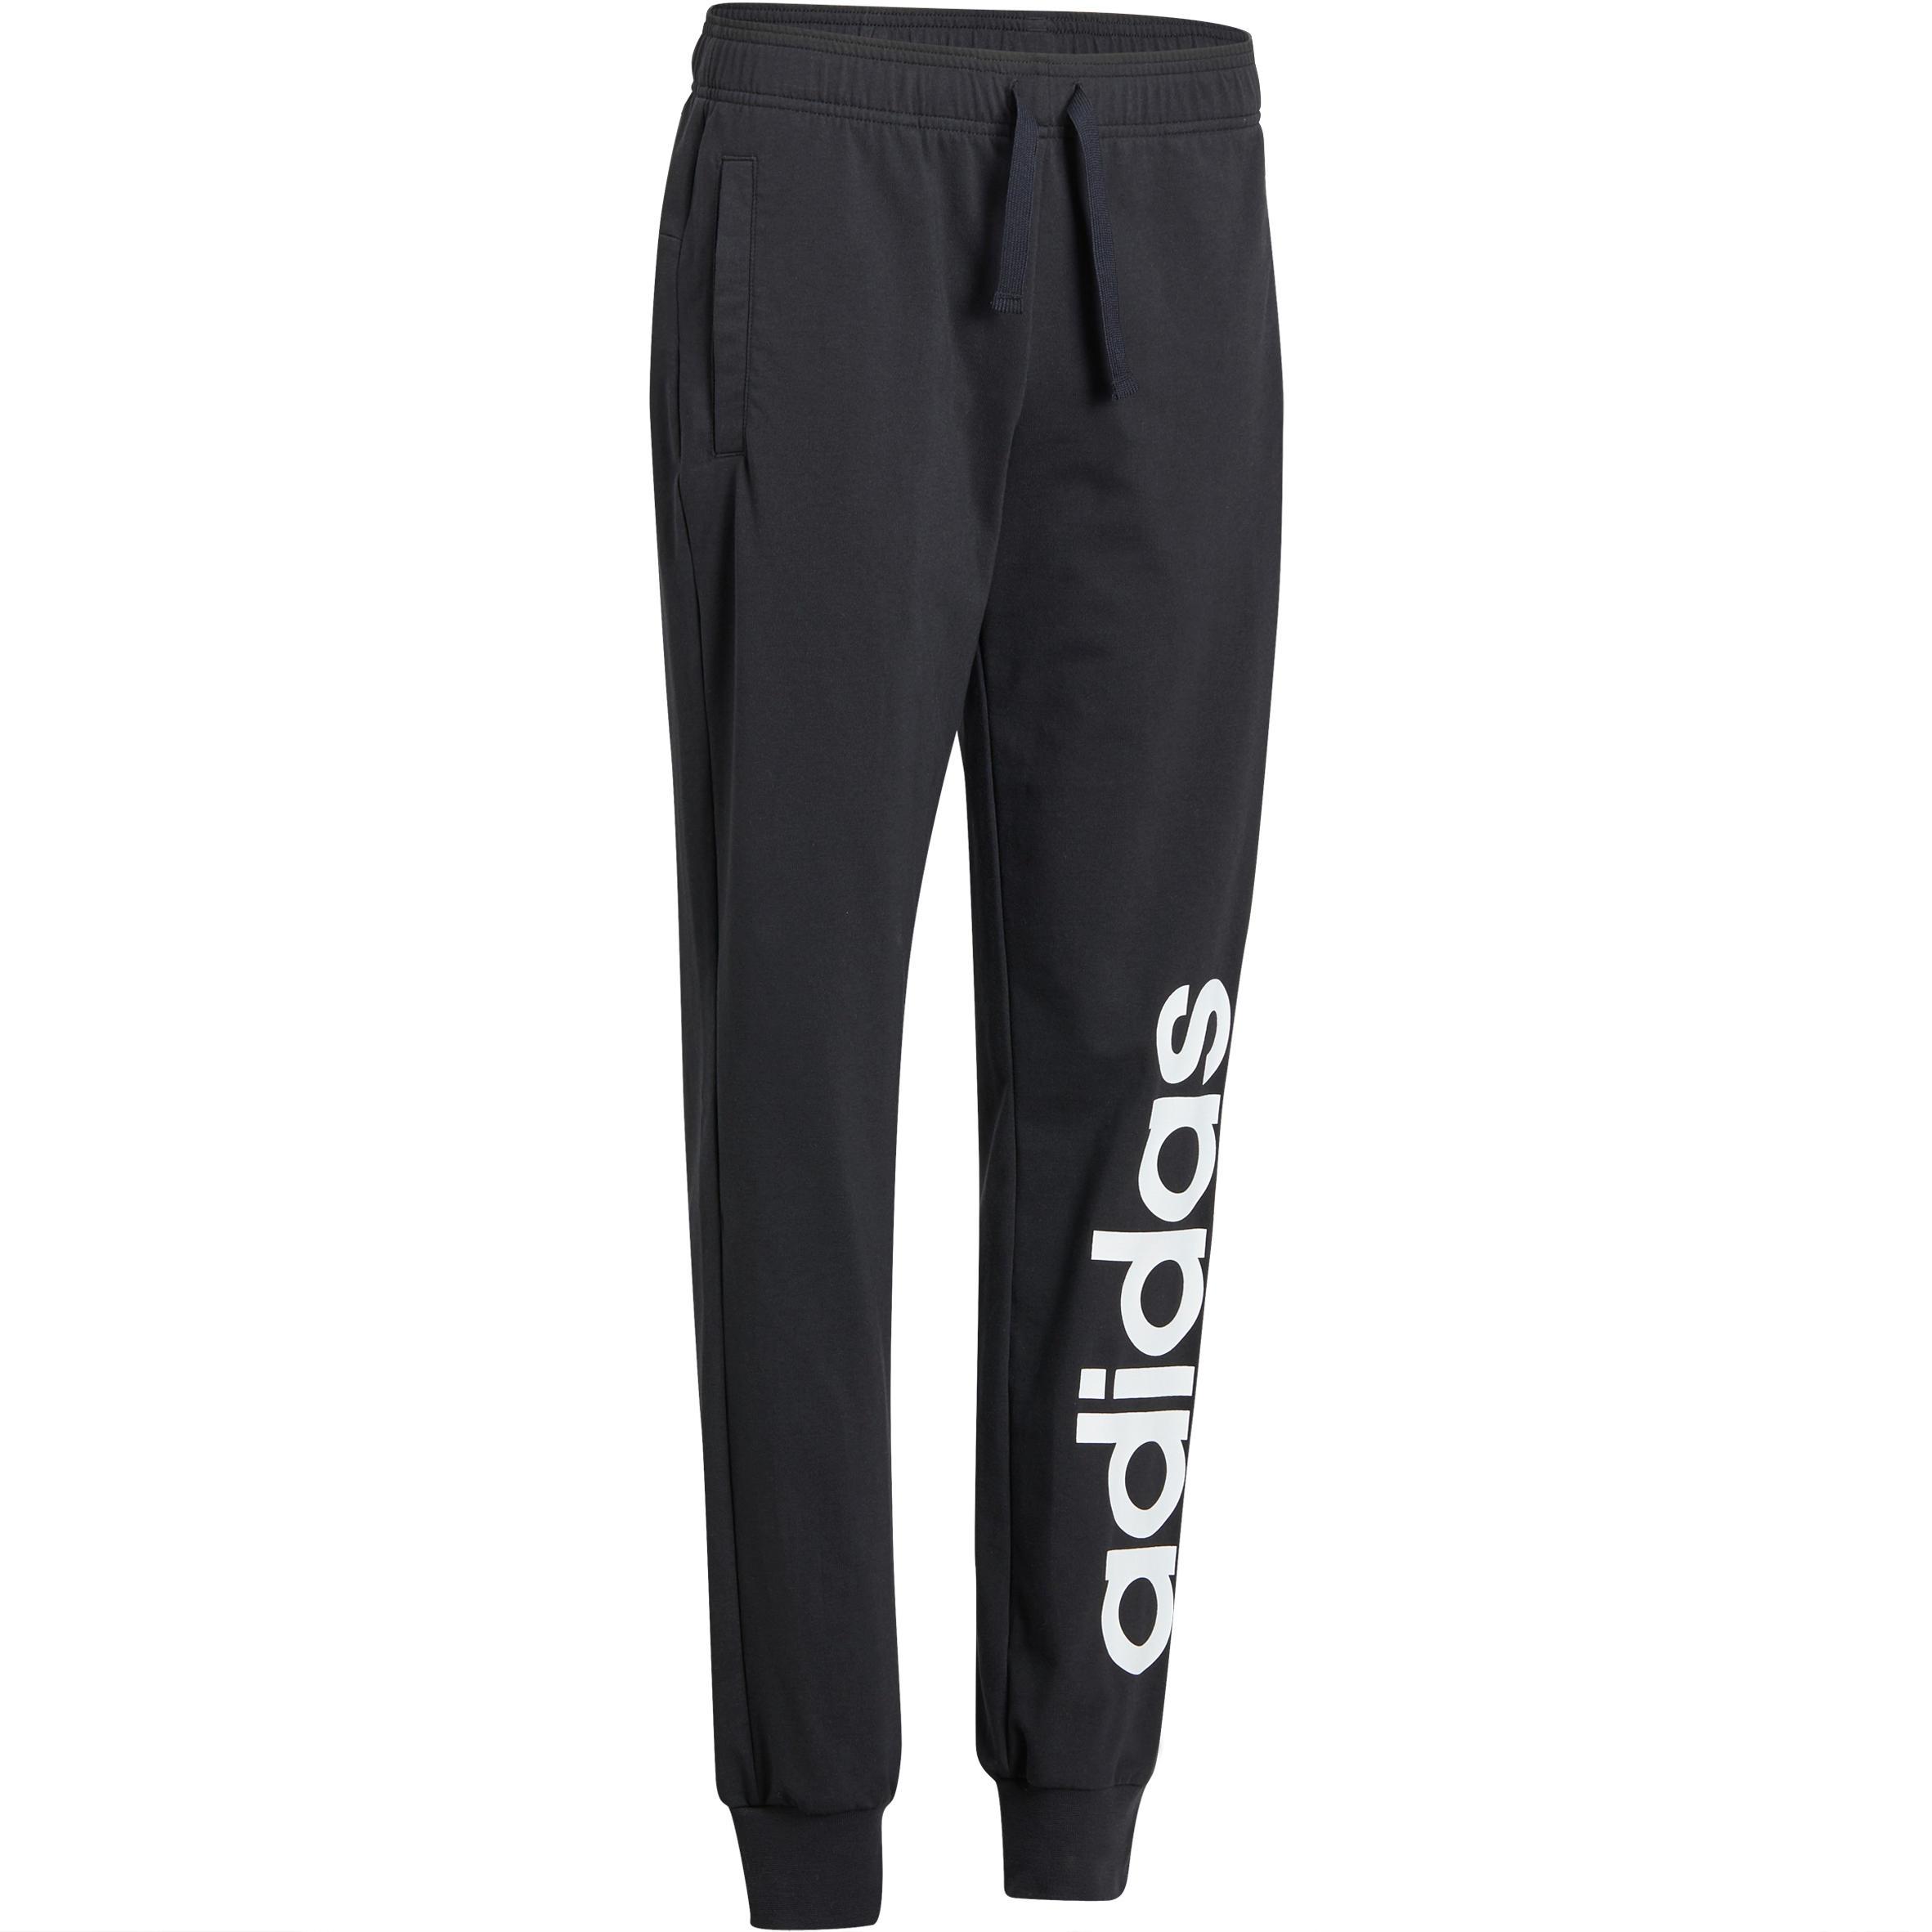 Fitnessbroek Adidas dames zwart